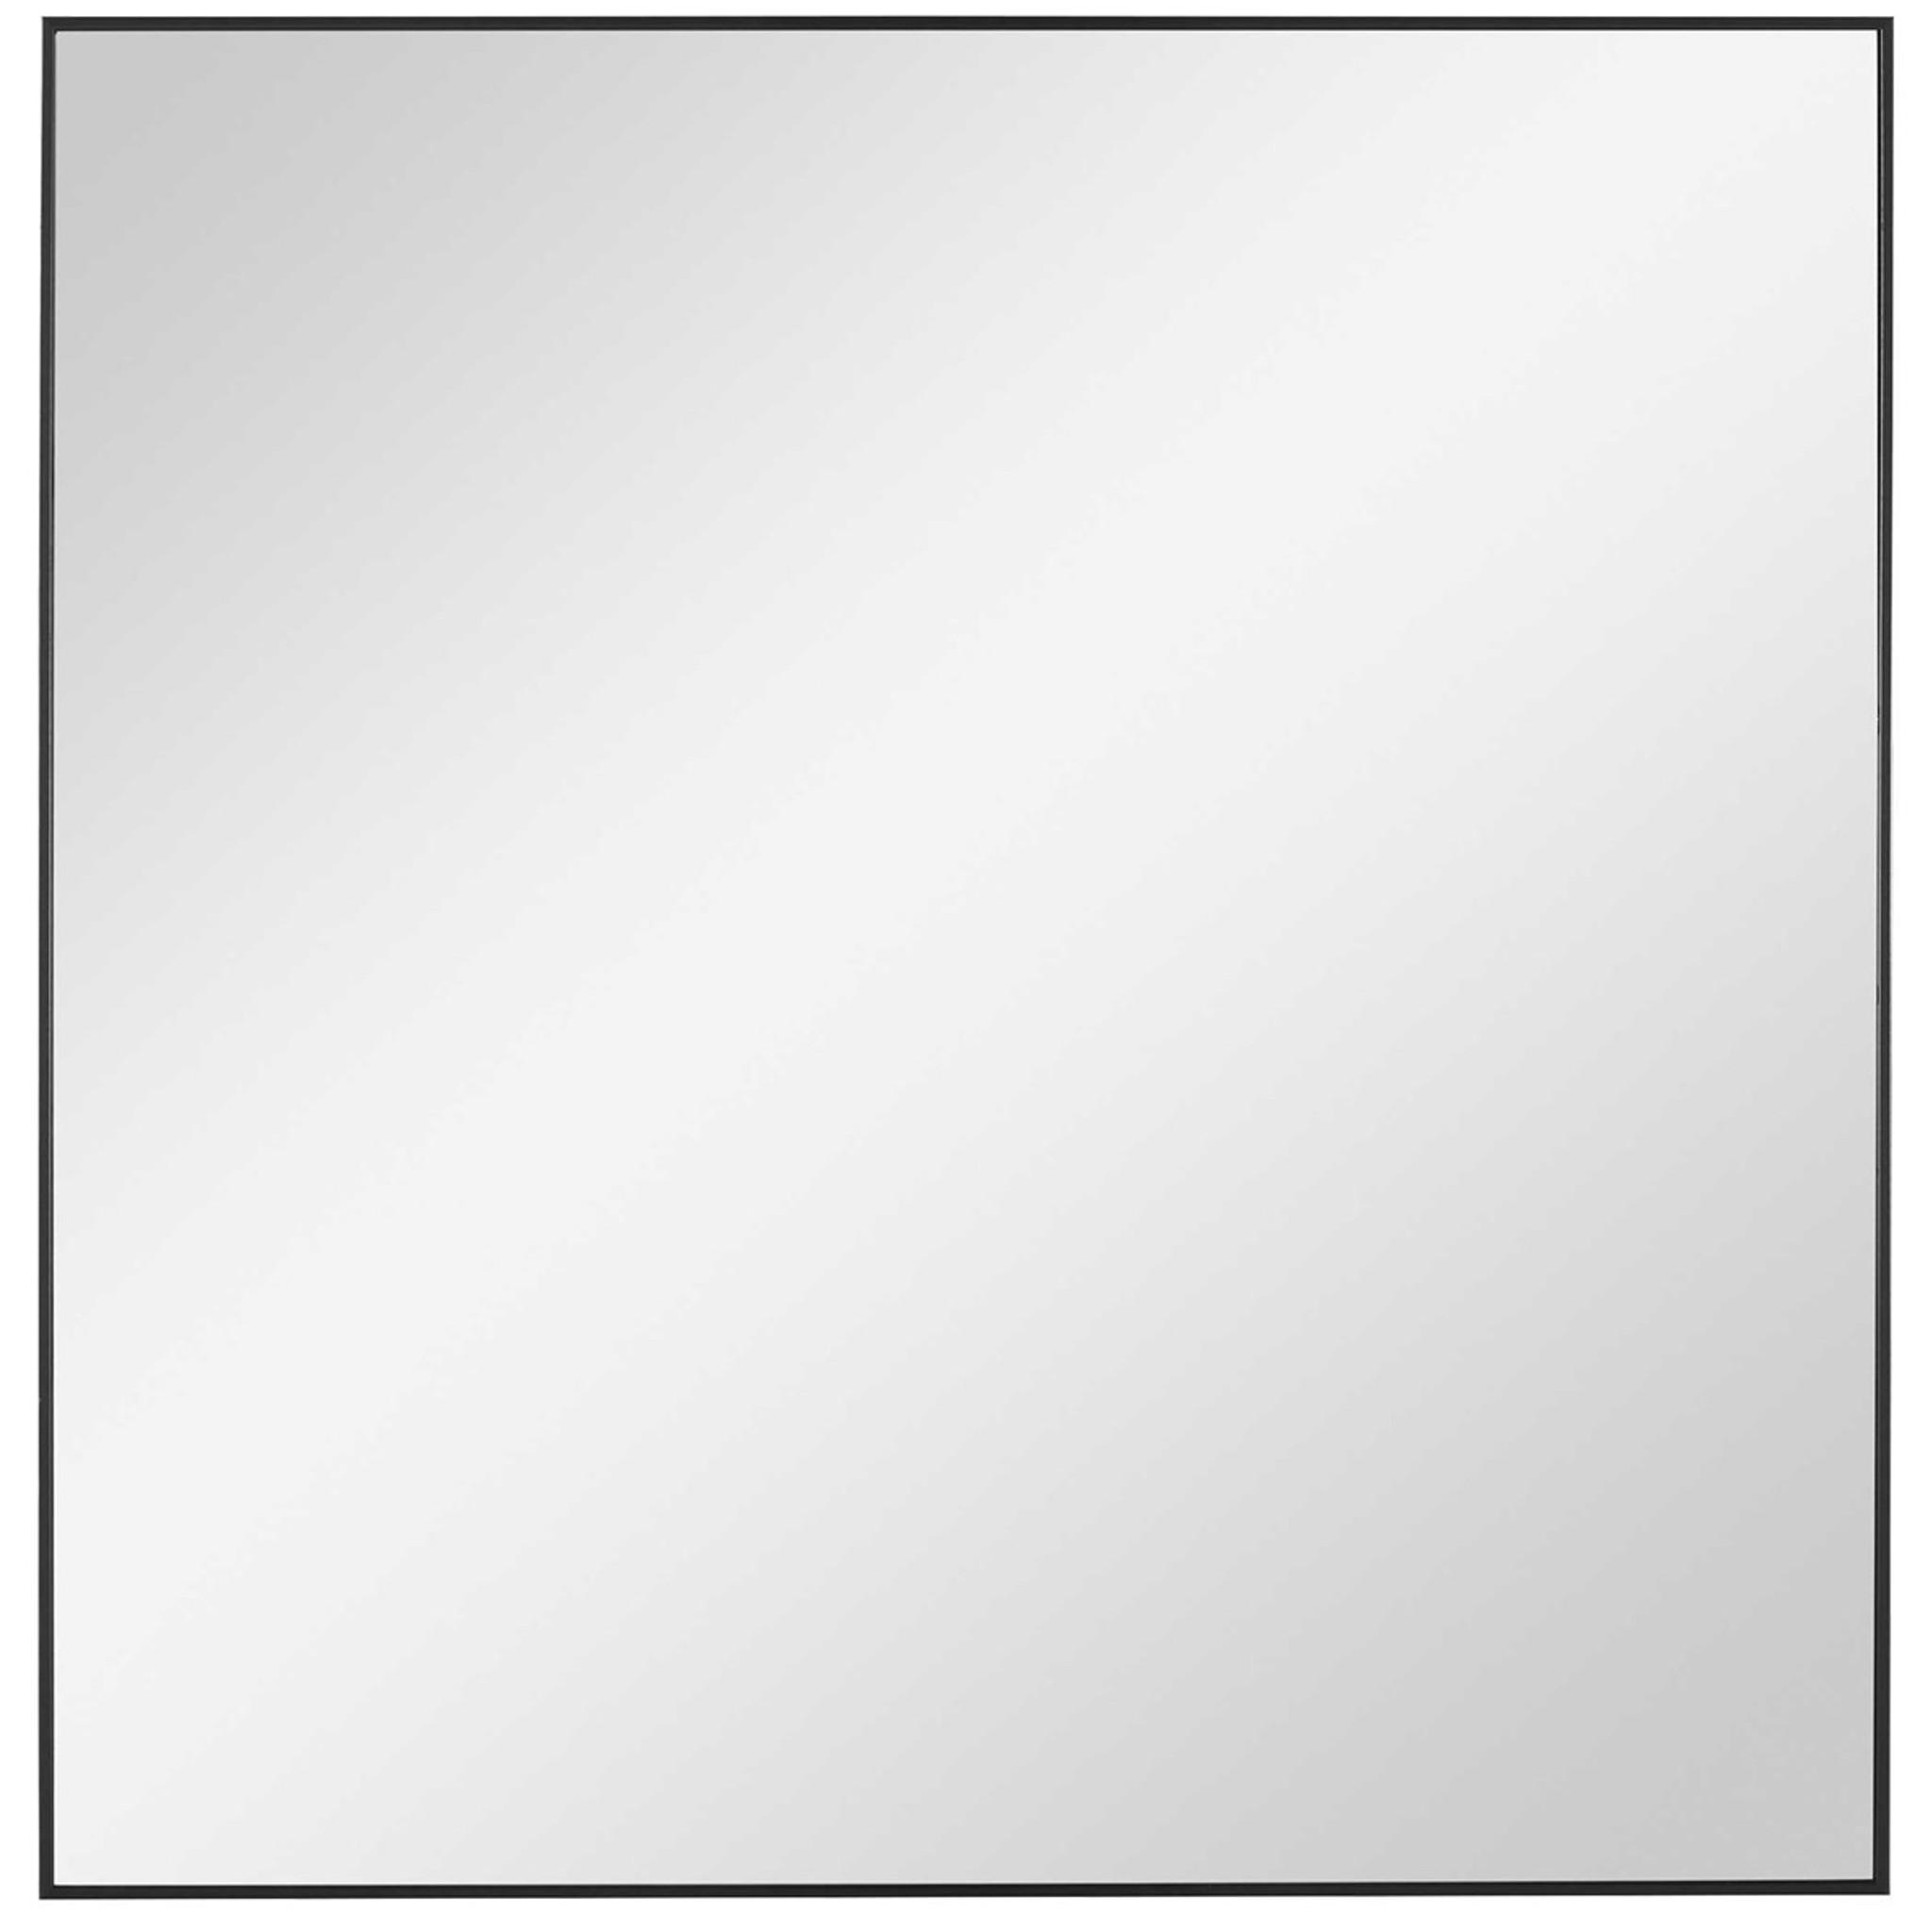 uttermost alexo black square modern simple edge frame wall mirror